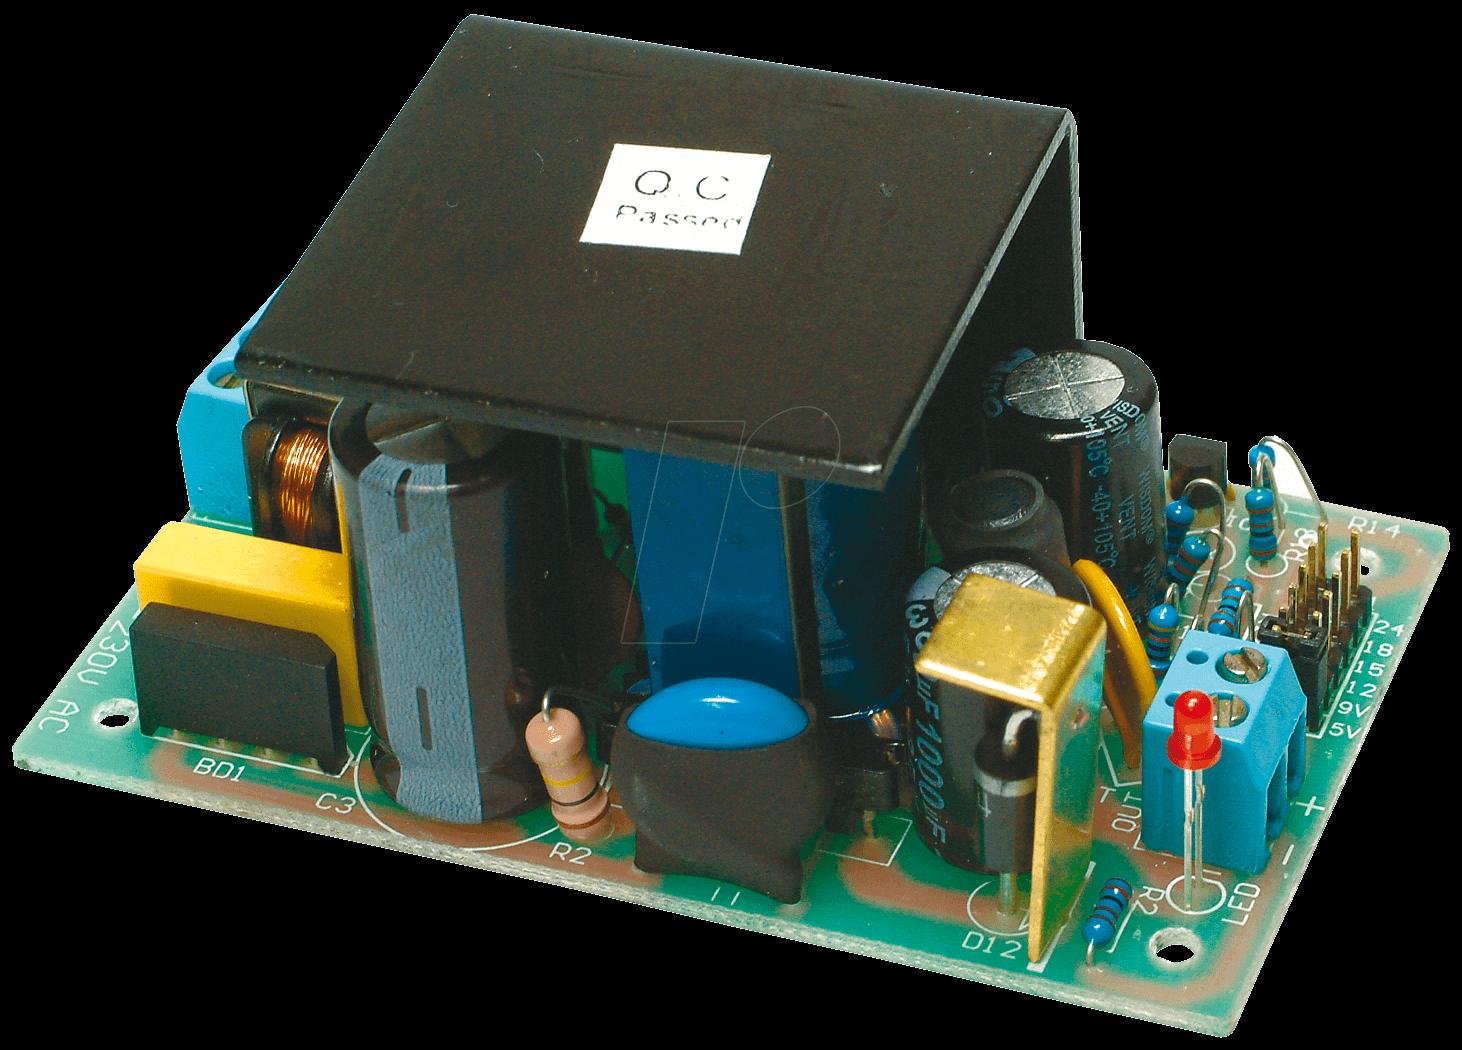 SP 1500: Schaltnetzteil, Open-Frame, 5 - 24 V, 1,5 A bei reichelt ...